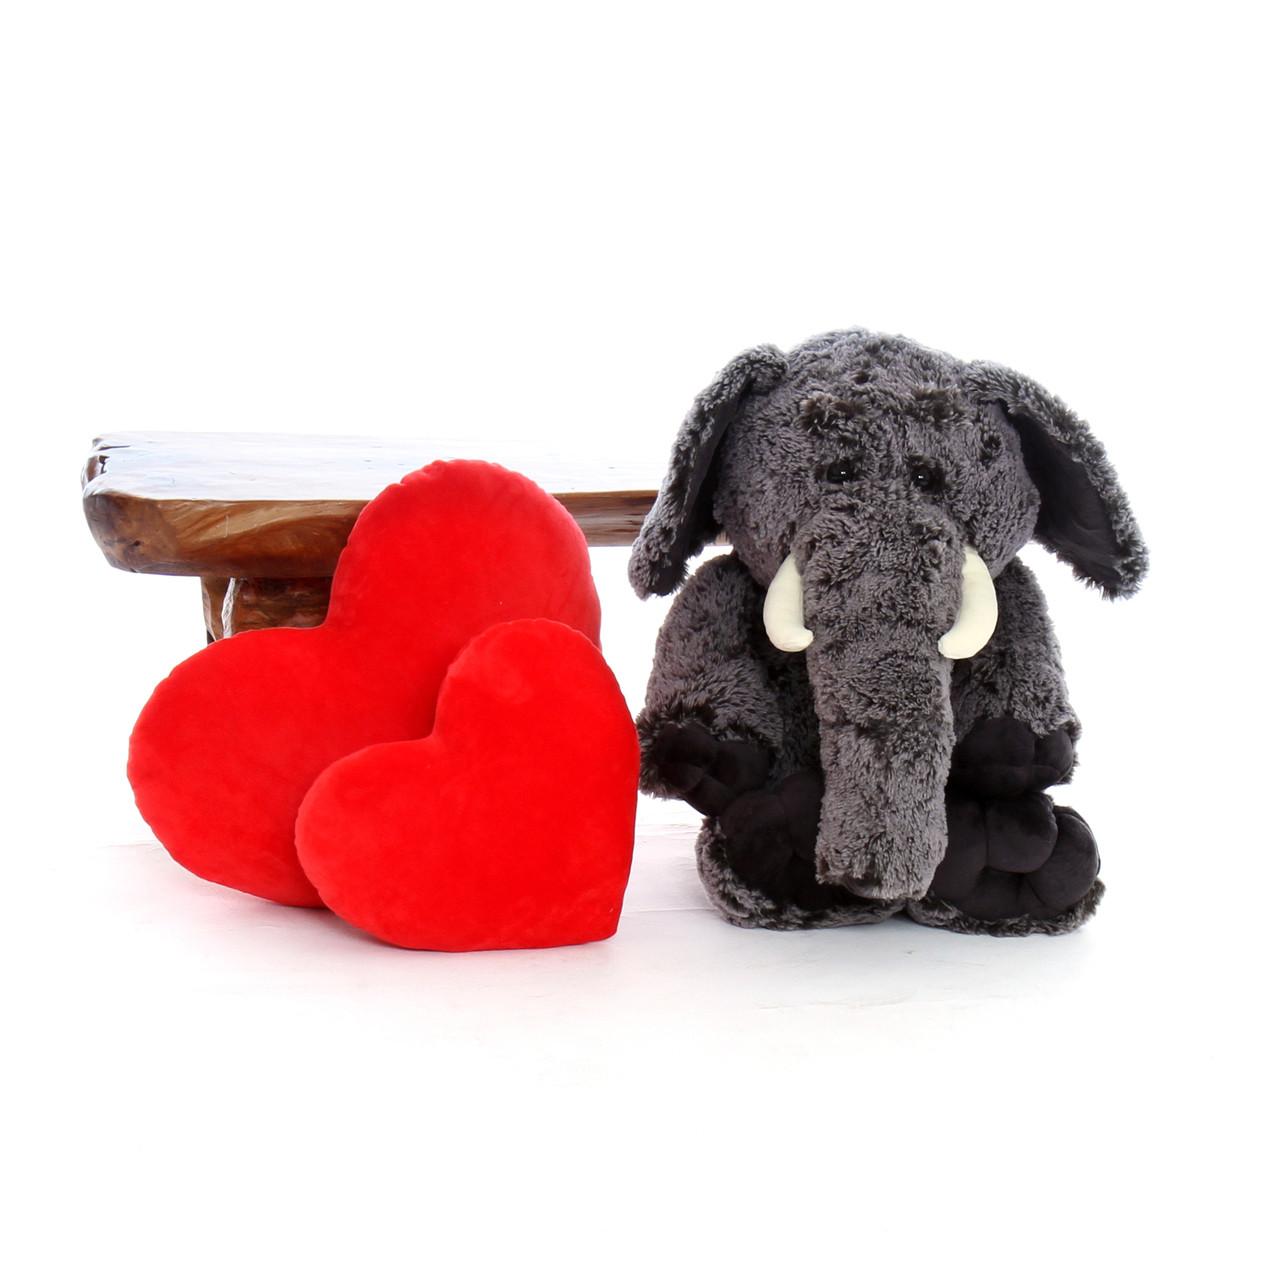 30in Big Stuffed Lucy Elephant - Giant Teddy